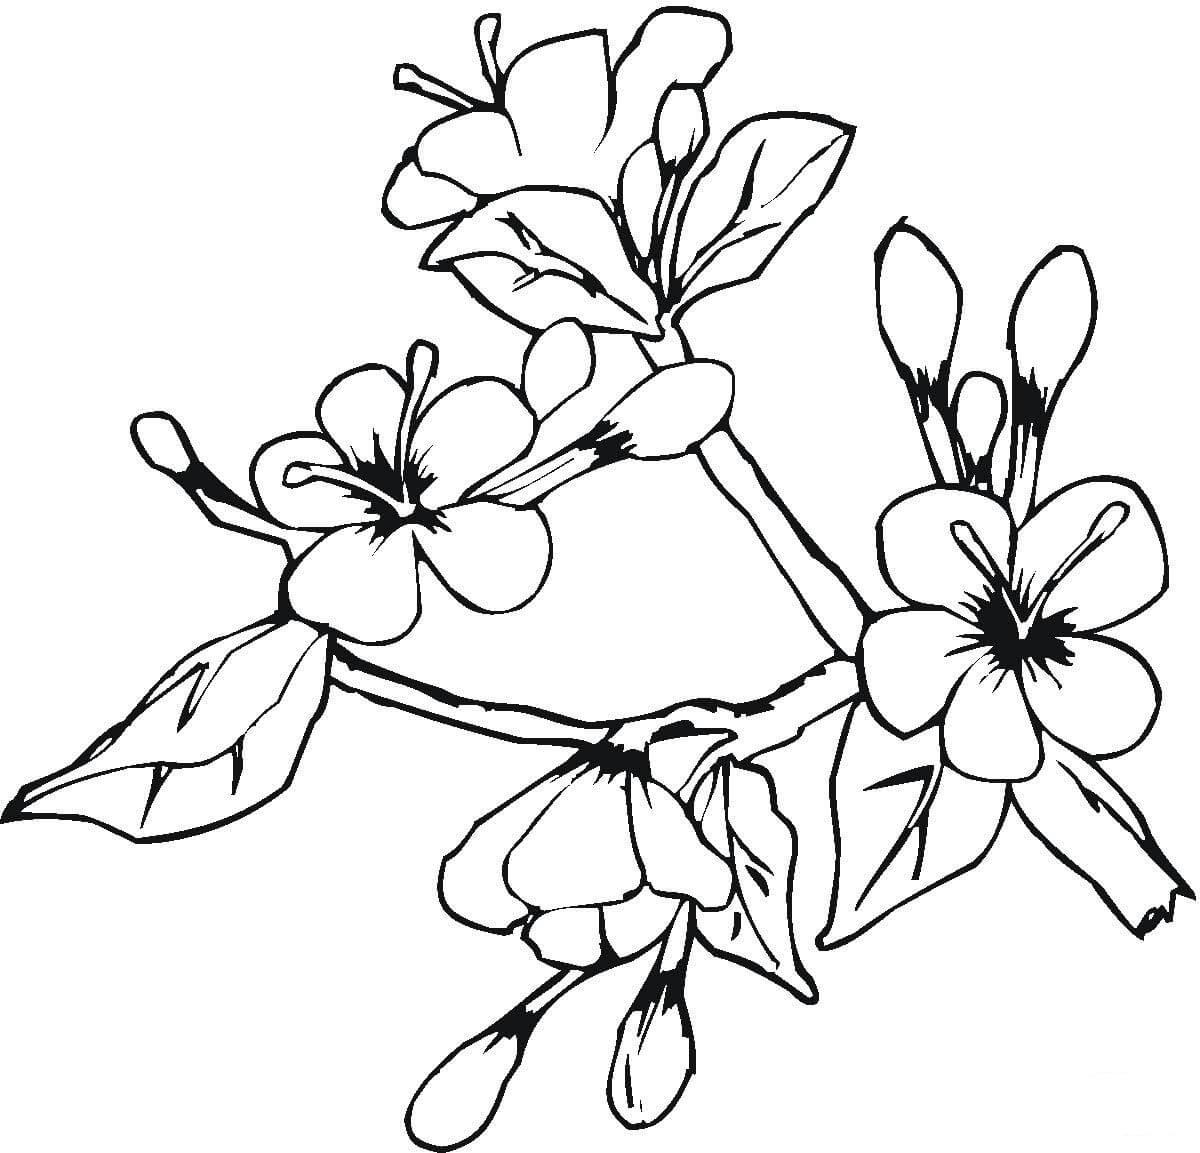 Blooming Flowers In May